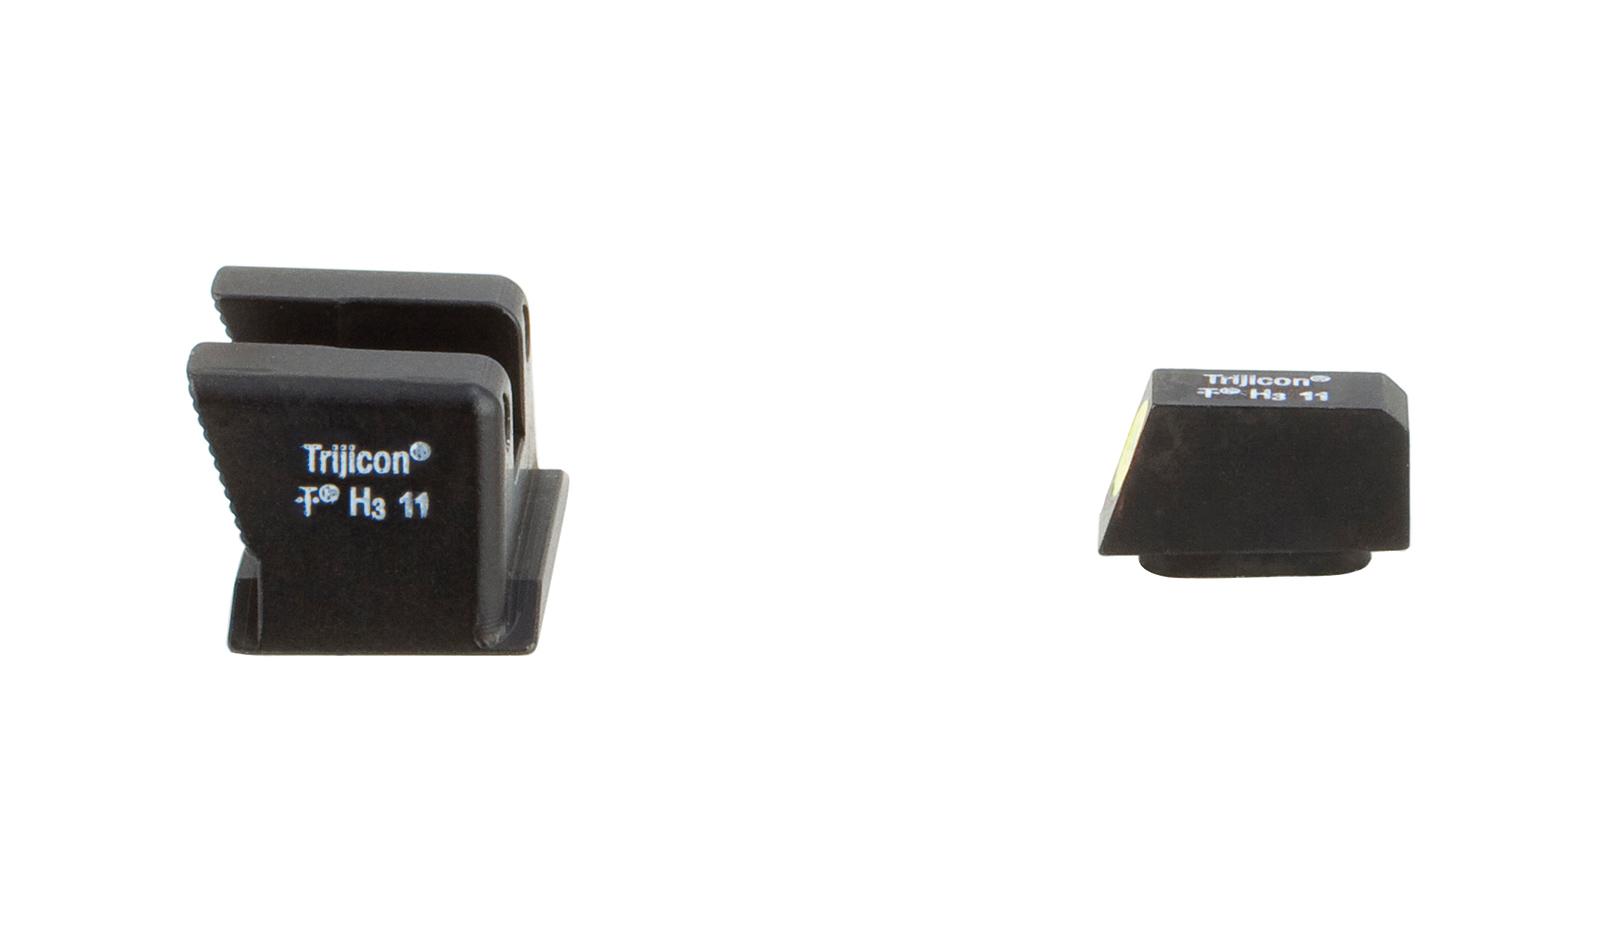 WP102-C-600742 angle 2